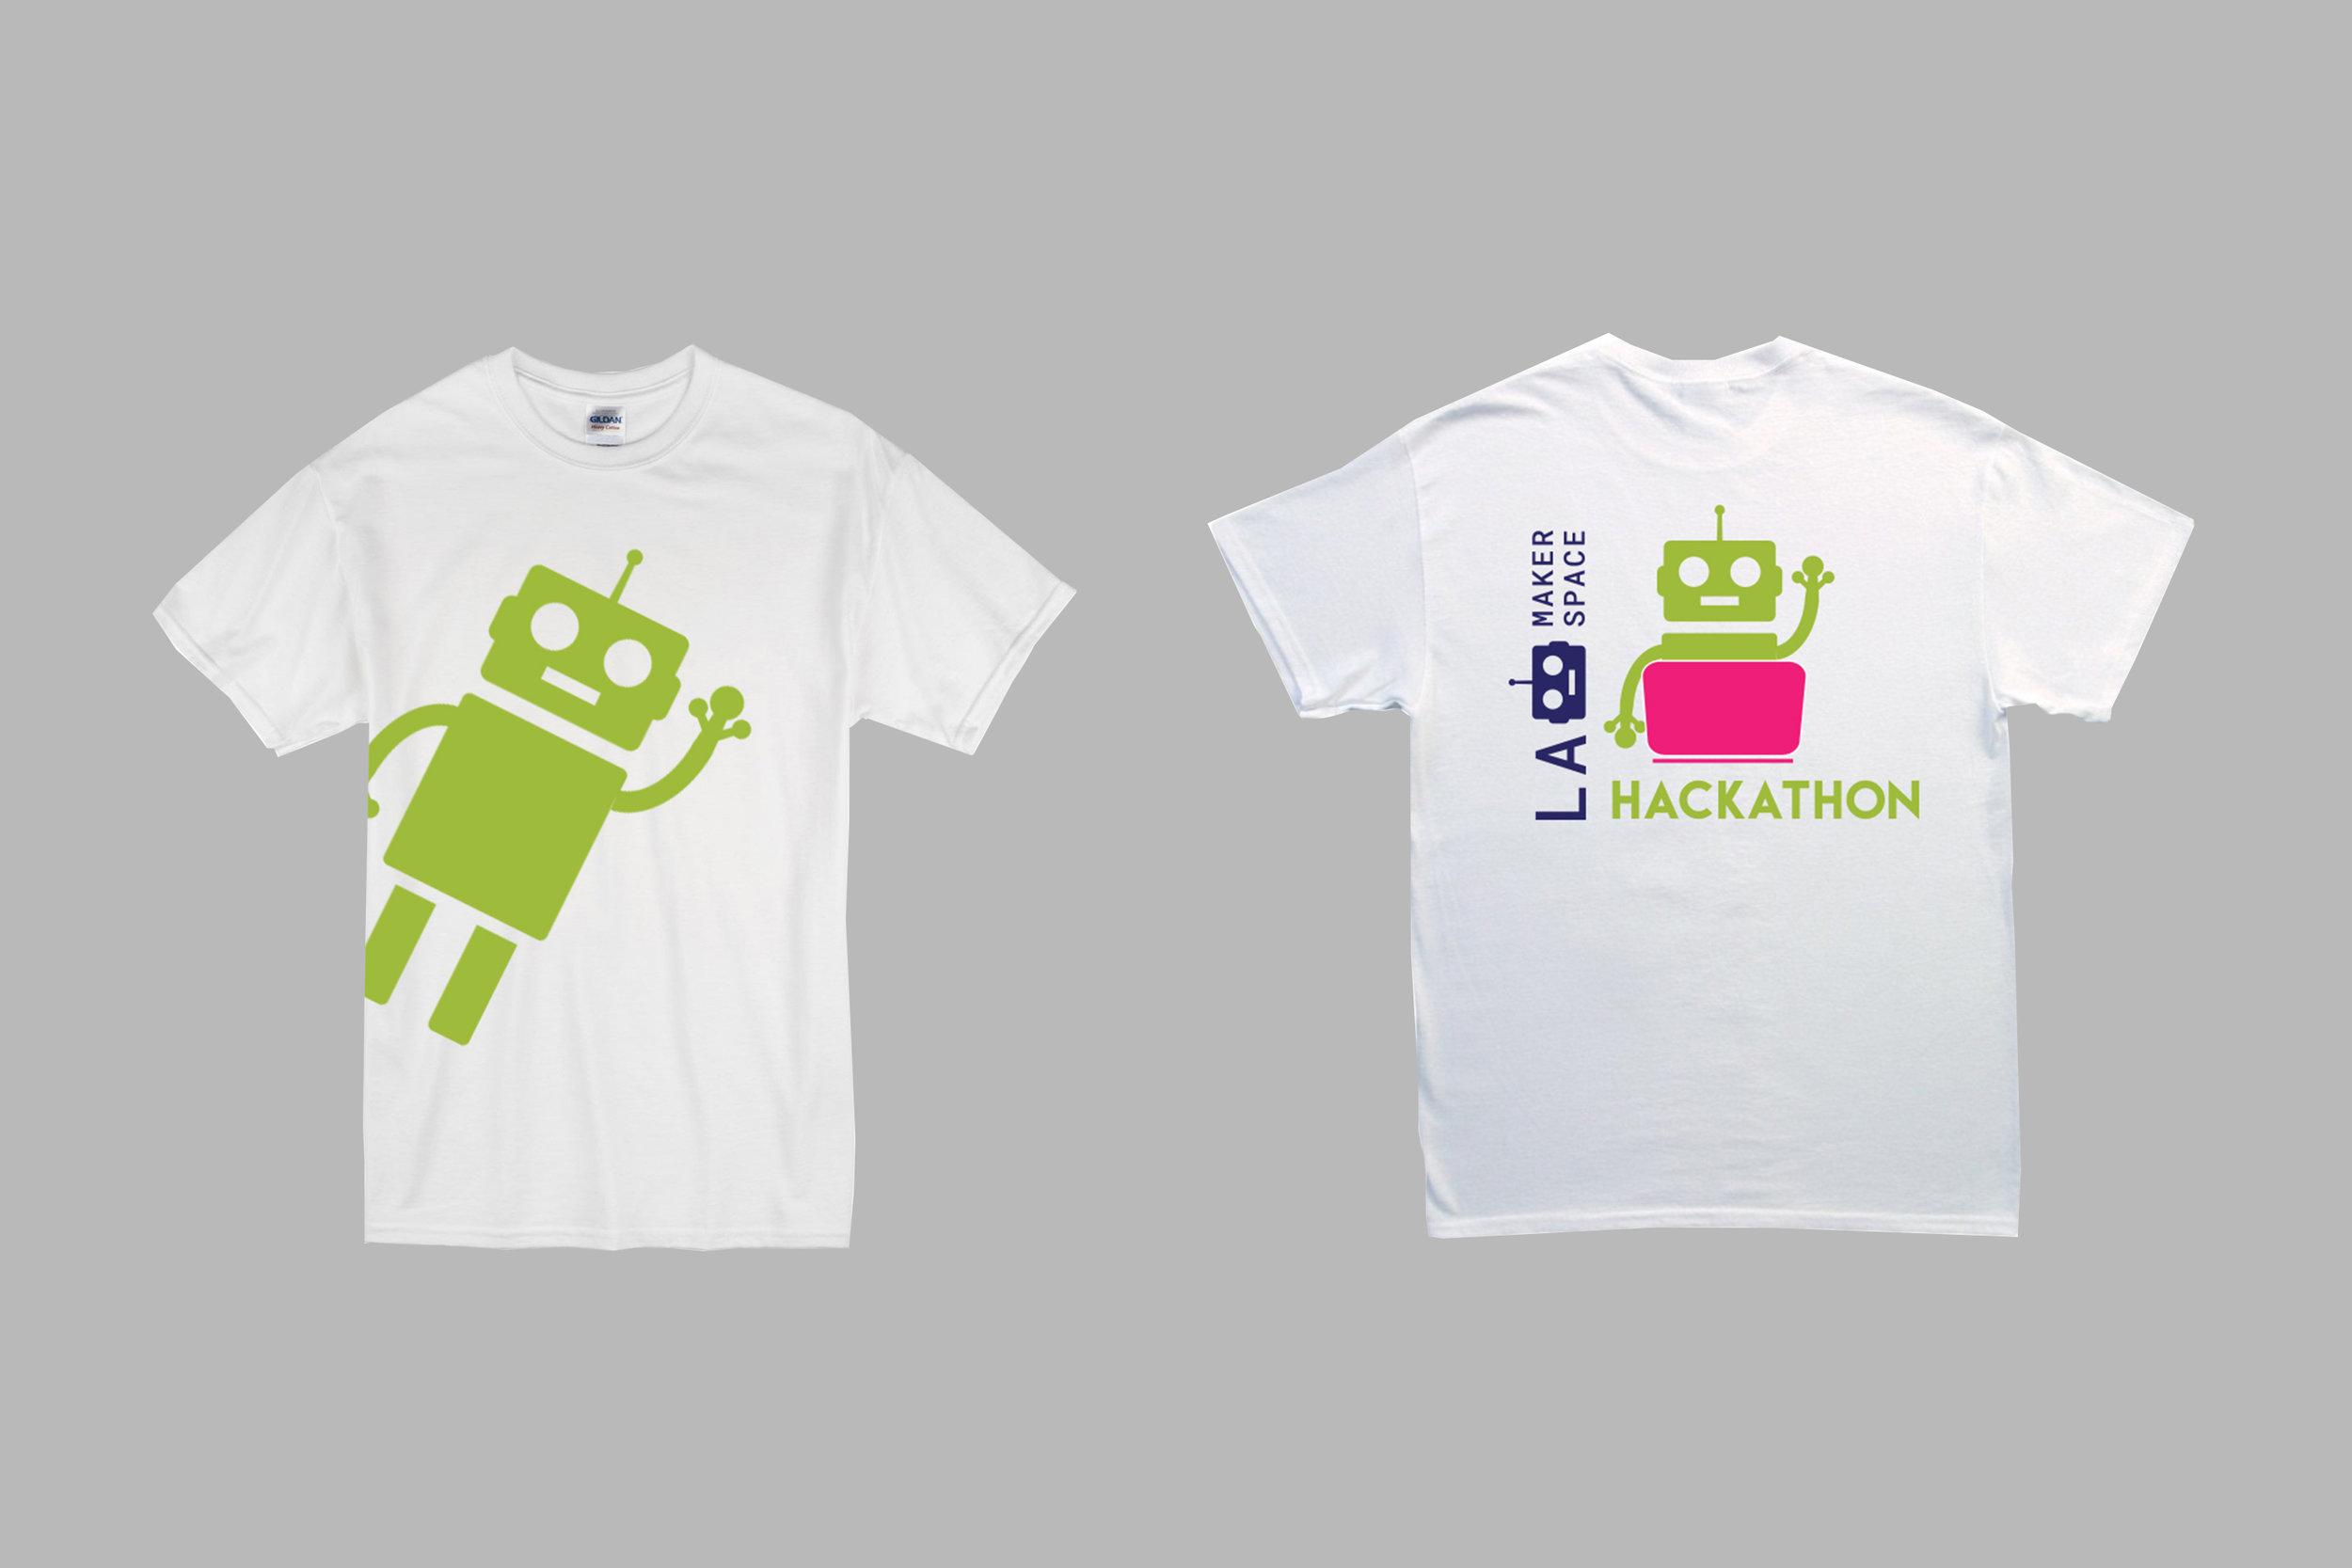 shadalene-la-makerspace-shirts-3.jpg